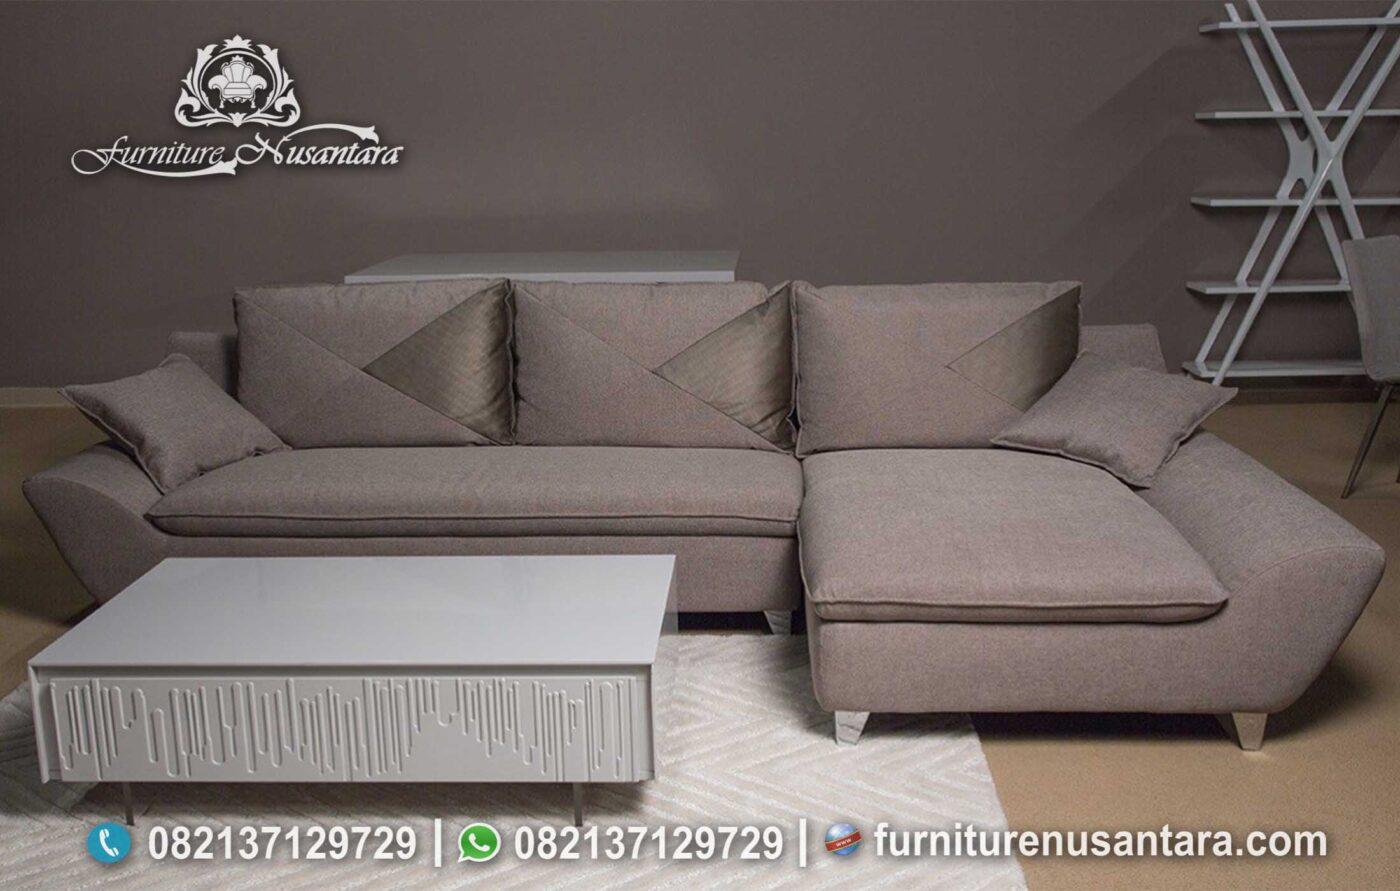 Harga Sofa Tamu Sudut 2021 ST-80, Furniture Nusantara